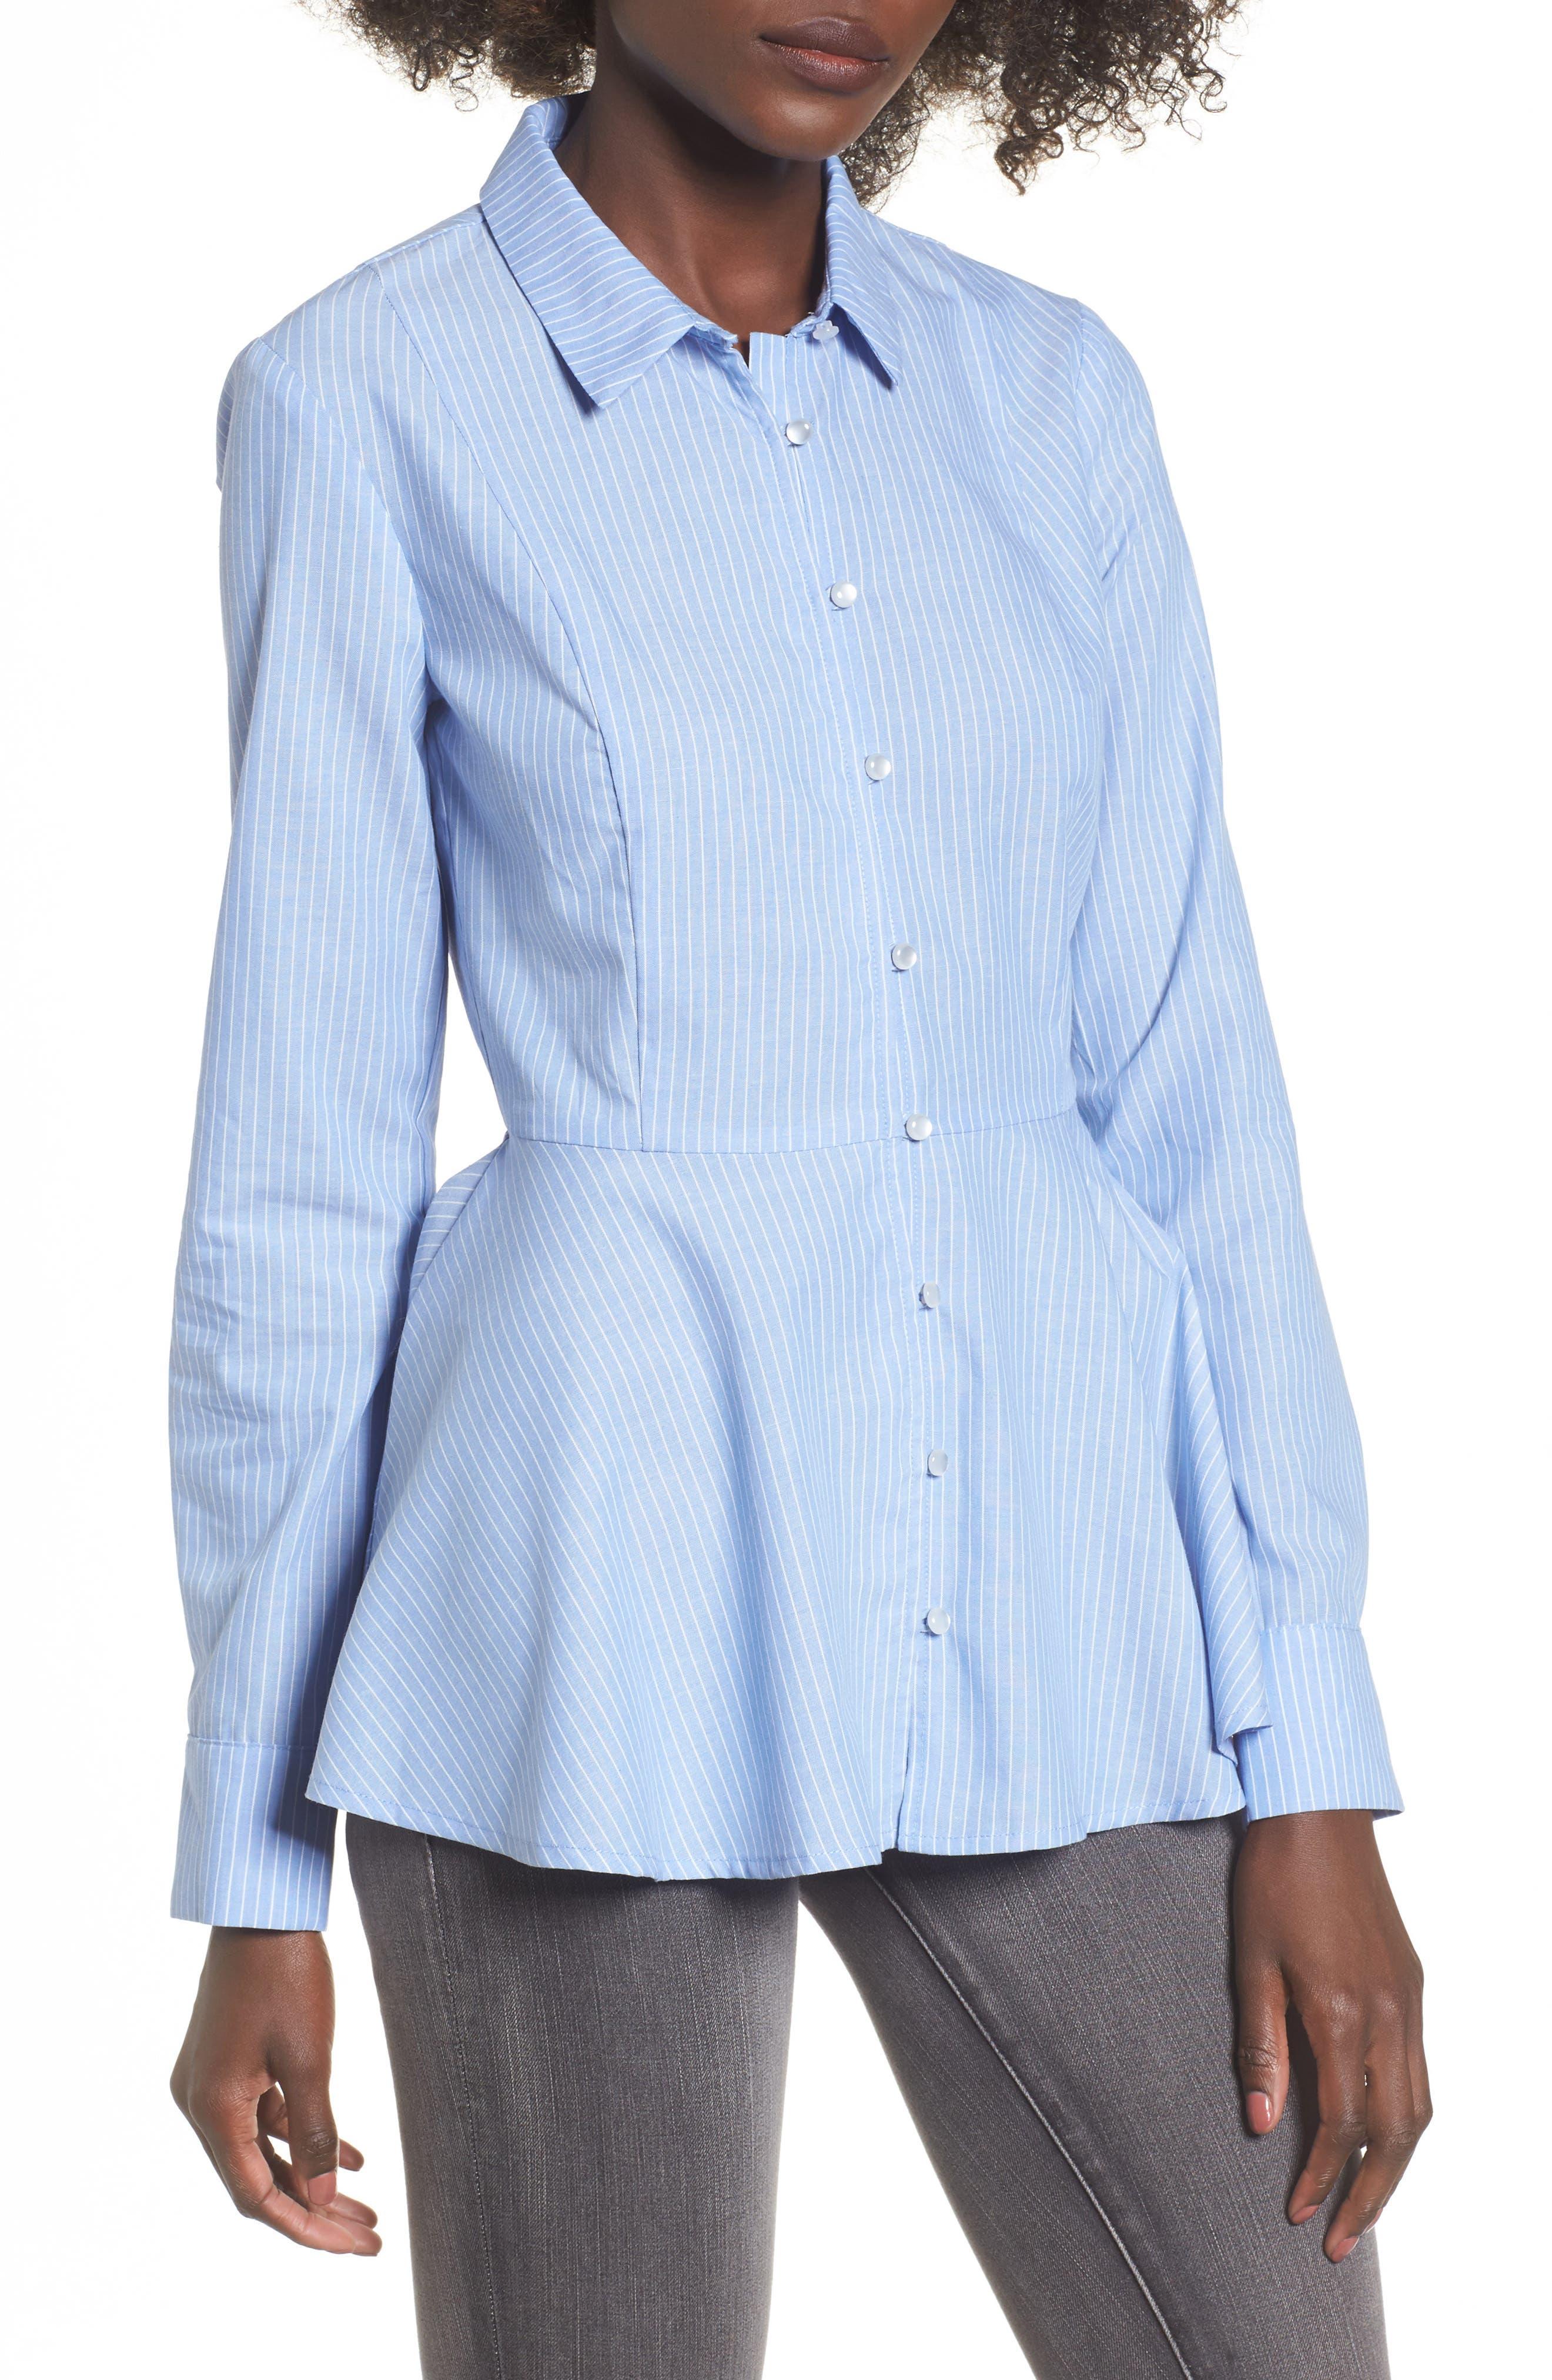 Stripe Peplum Shirt,                             Main thumbnail 1, color,                             Blue/ White